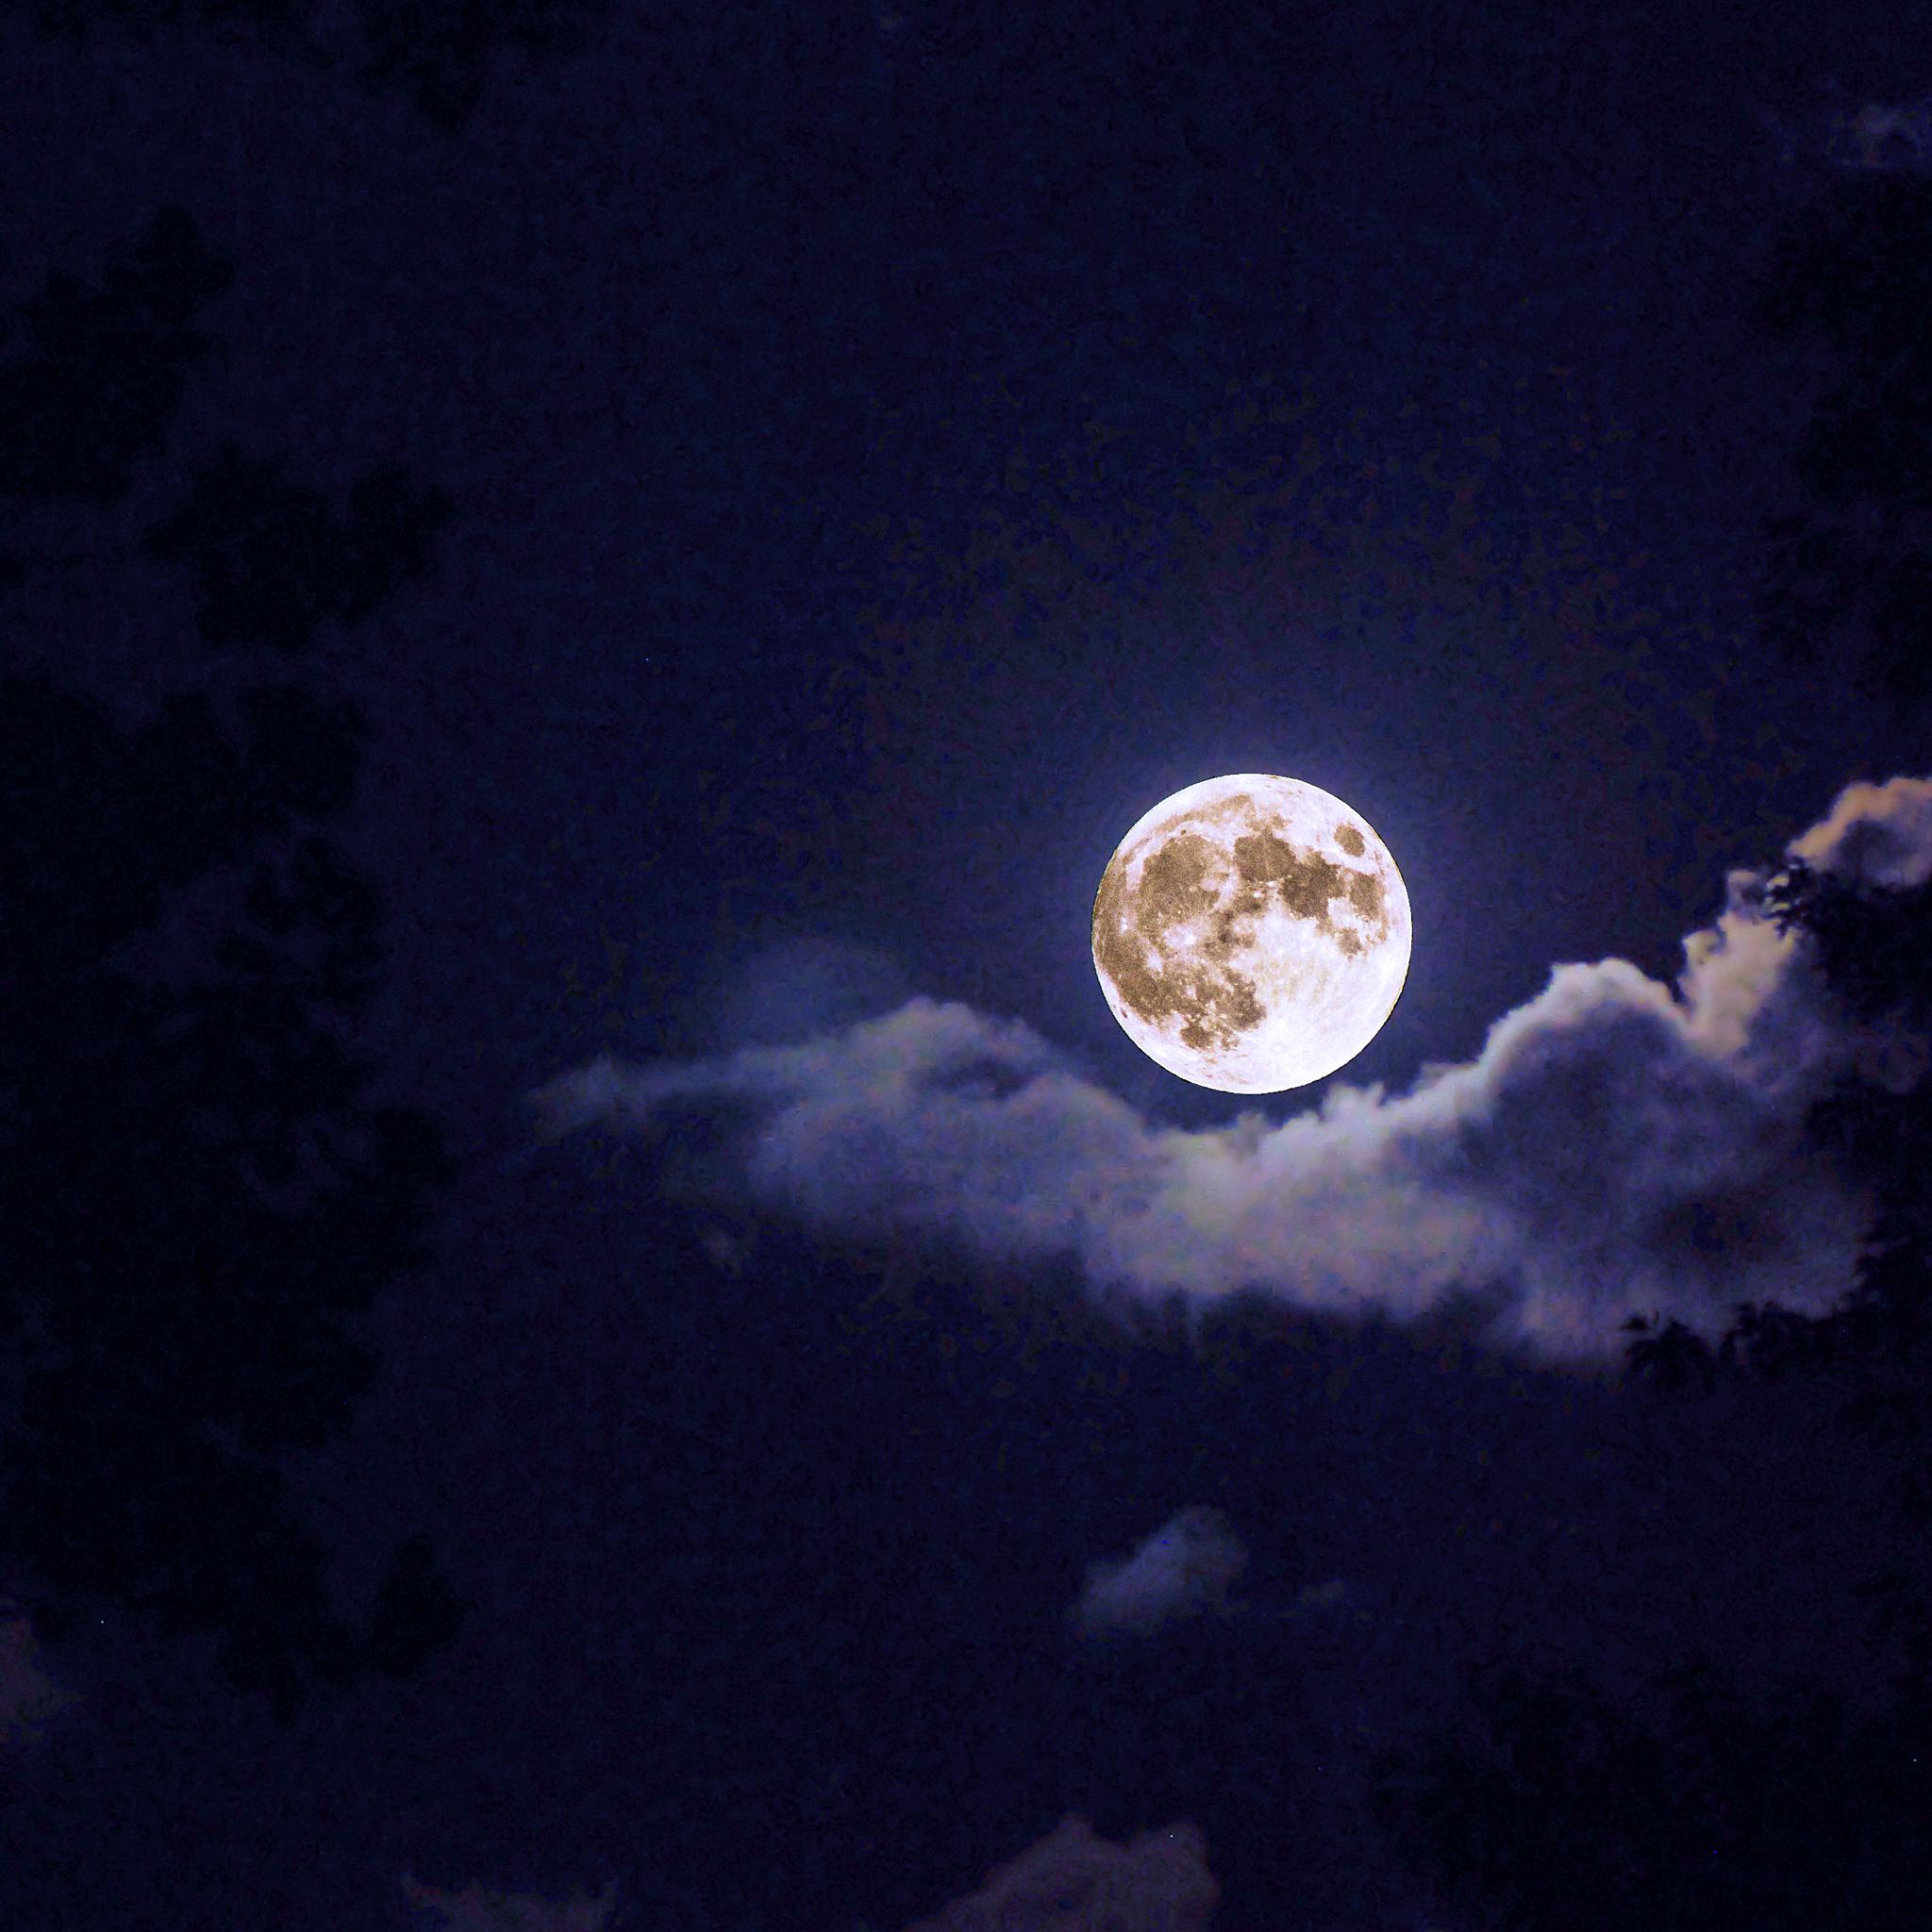 Moon-Out-Tonight-3Wallpapers-iPad-Retina